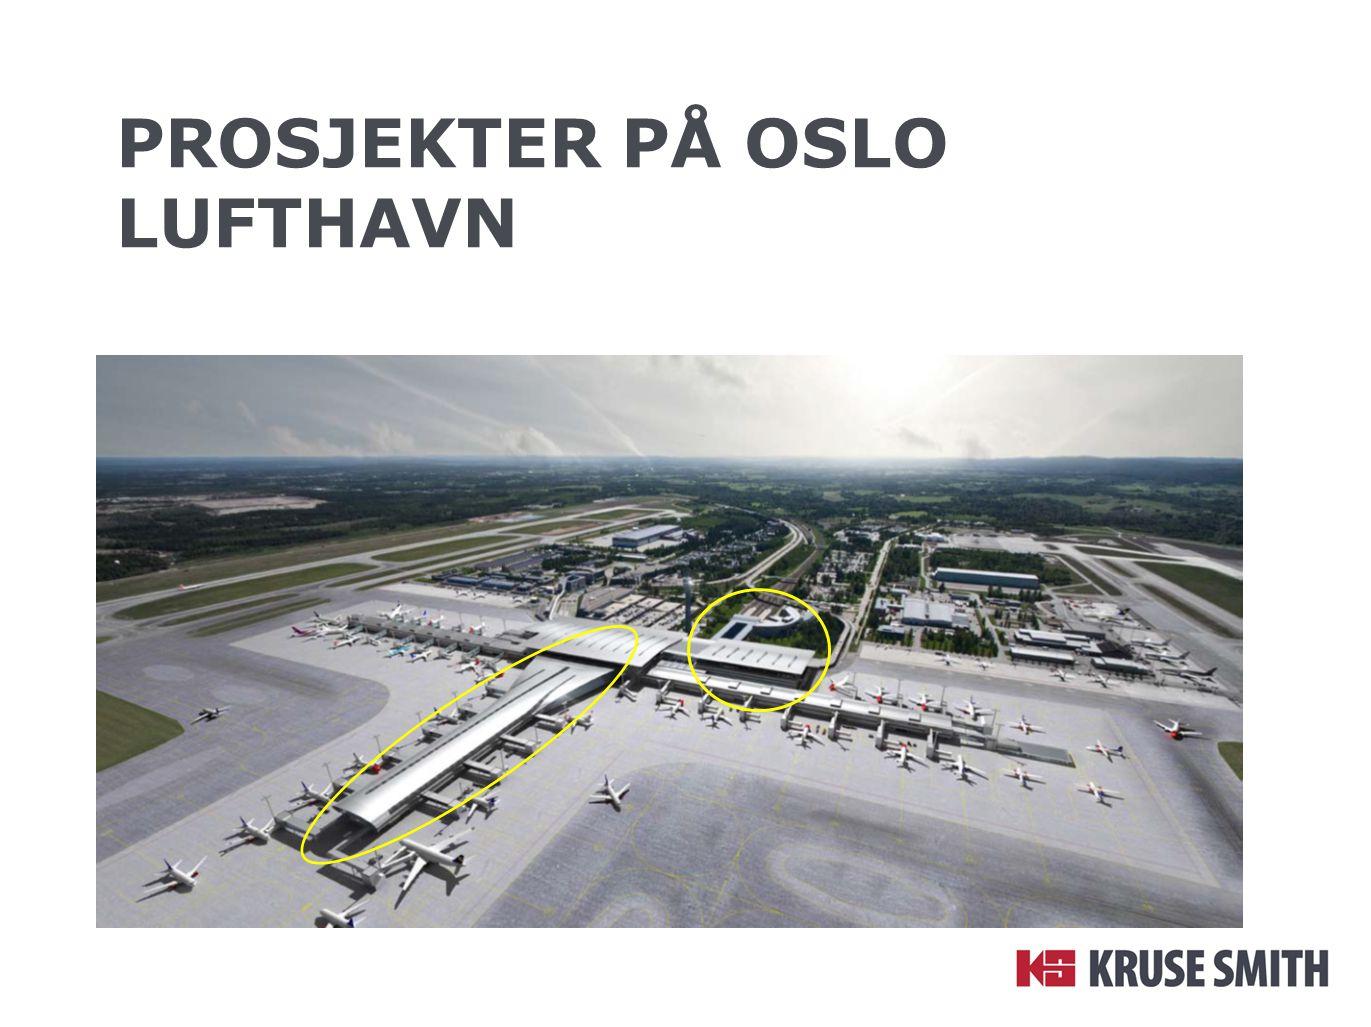 Prosjekter på OSLo lufthavn